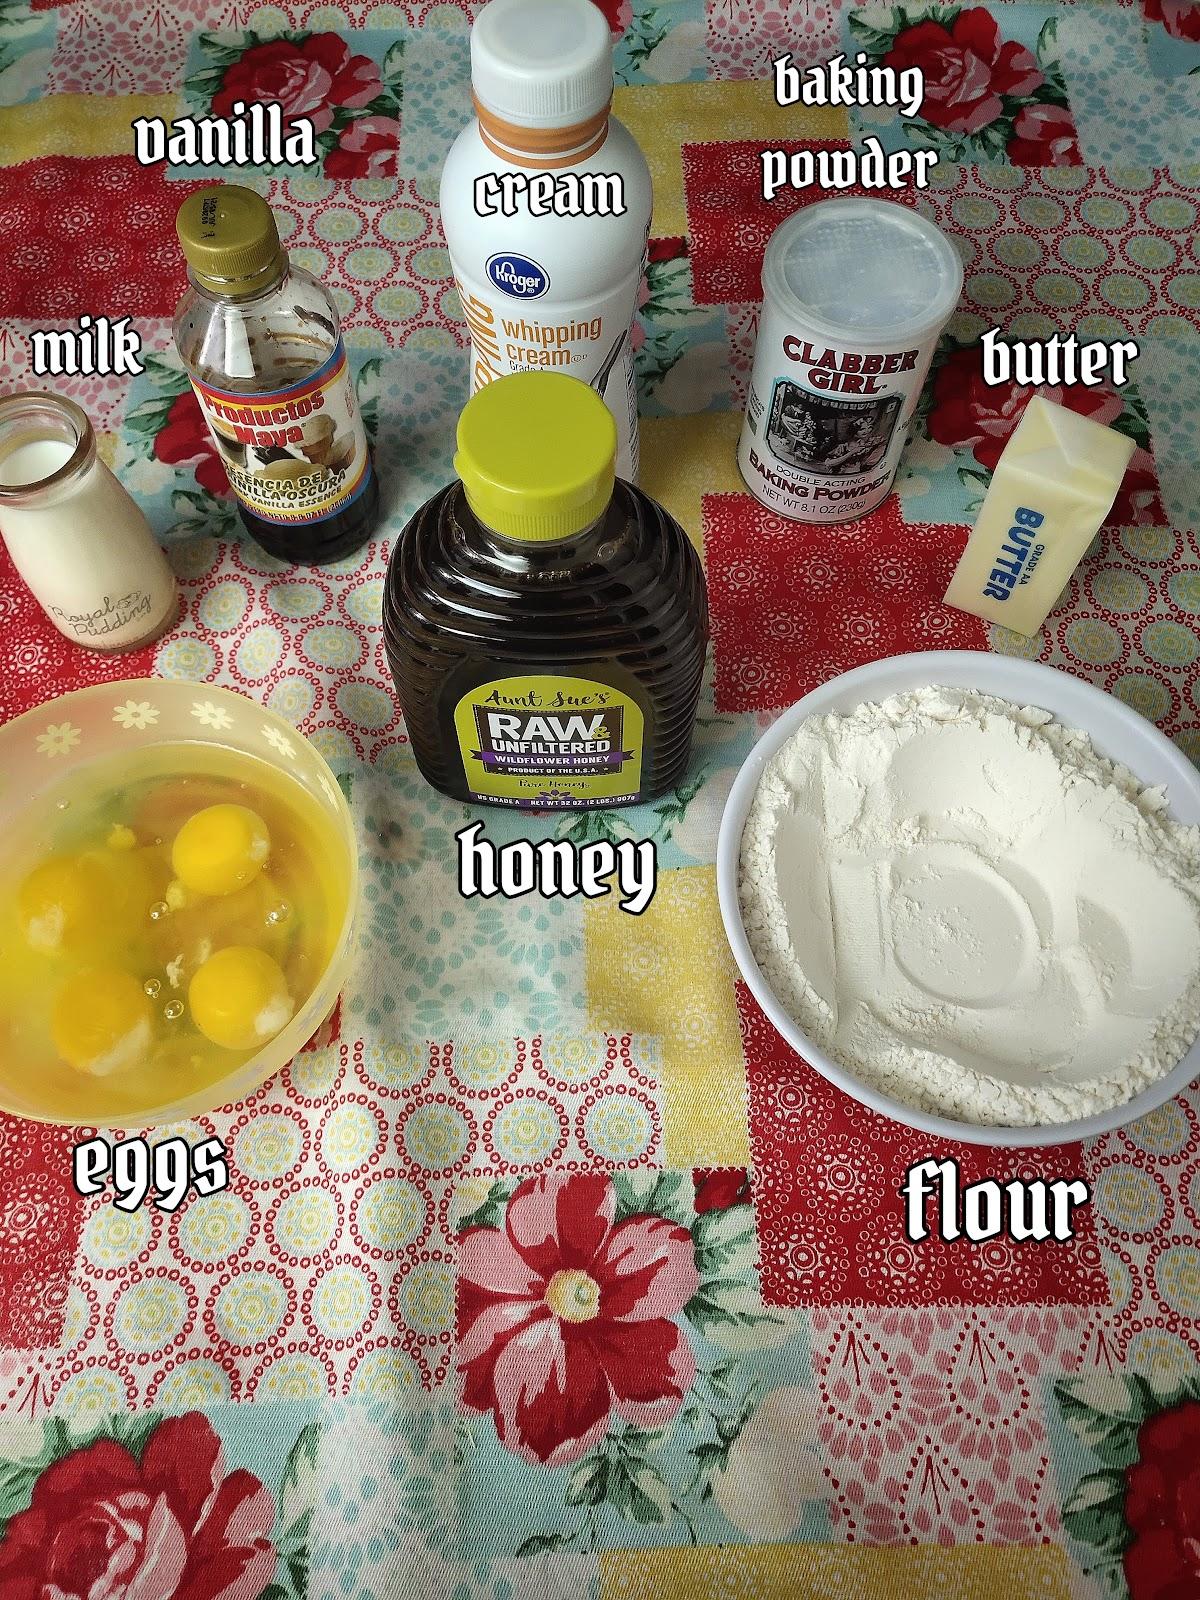 beltane recipes, beltane milk cake, beltane altar, beltane oat cakes, beltane caudle